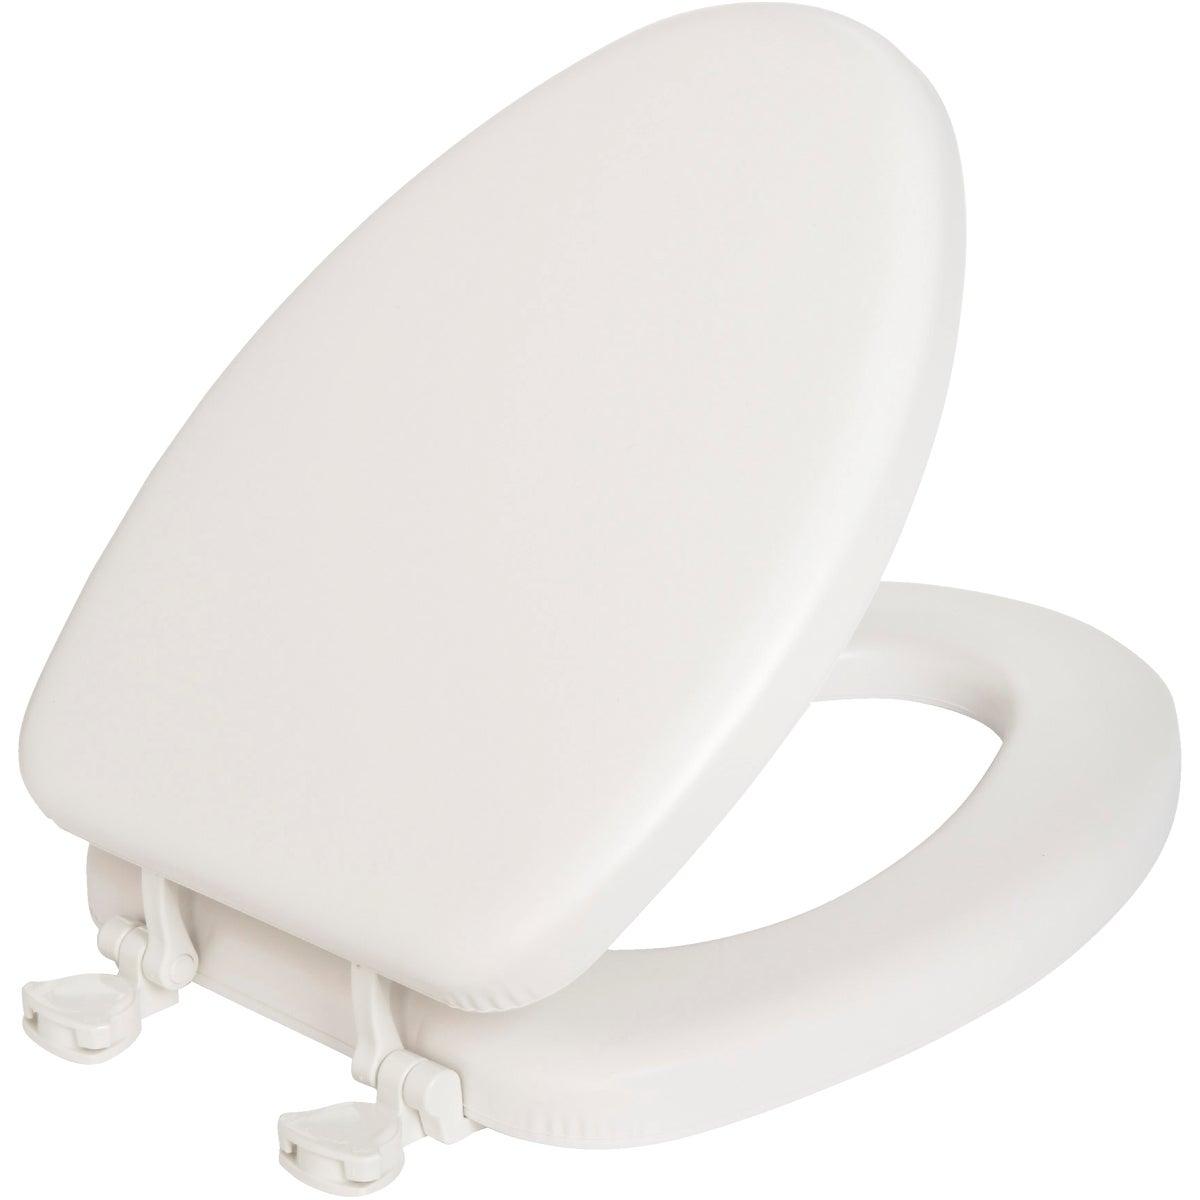 WHT SOFT ELONG SEAT